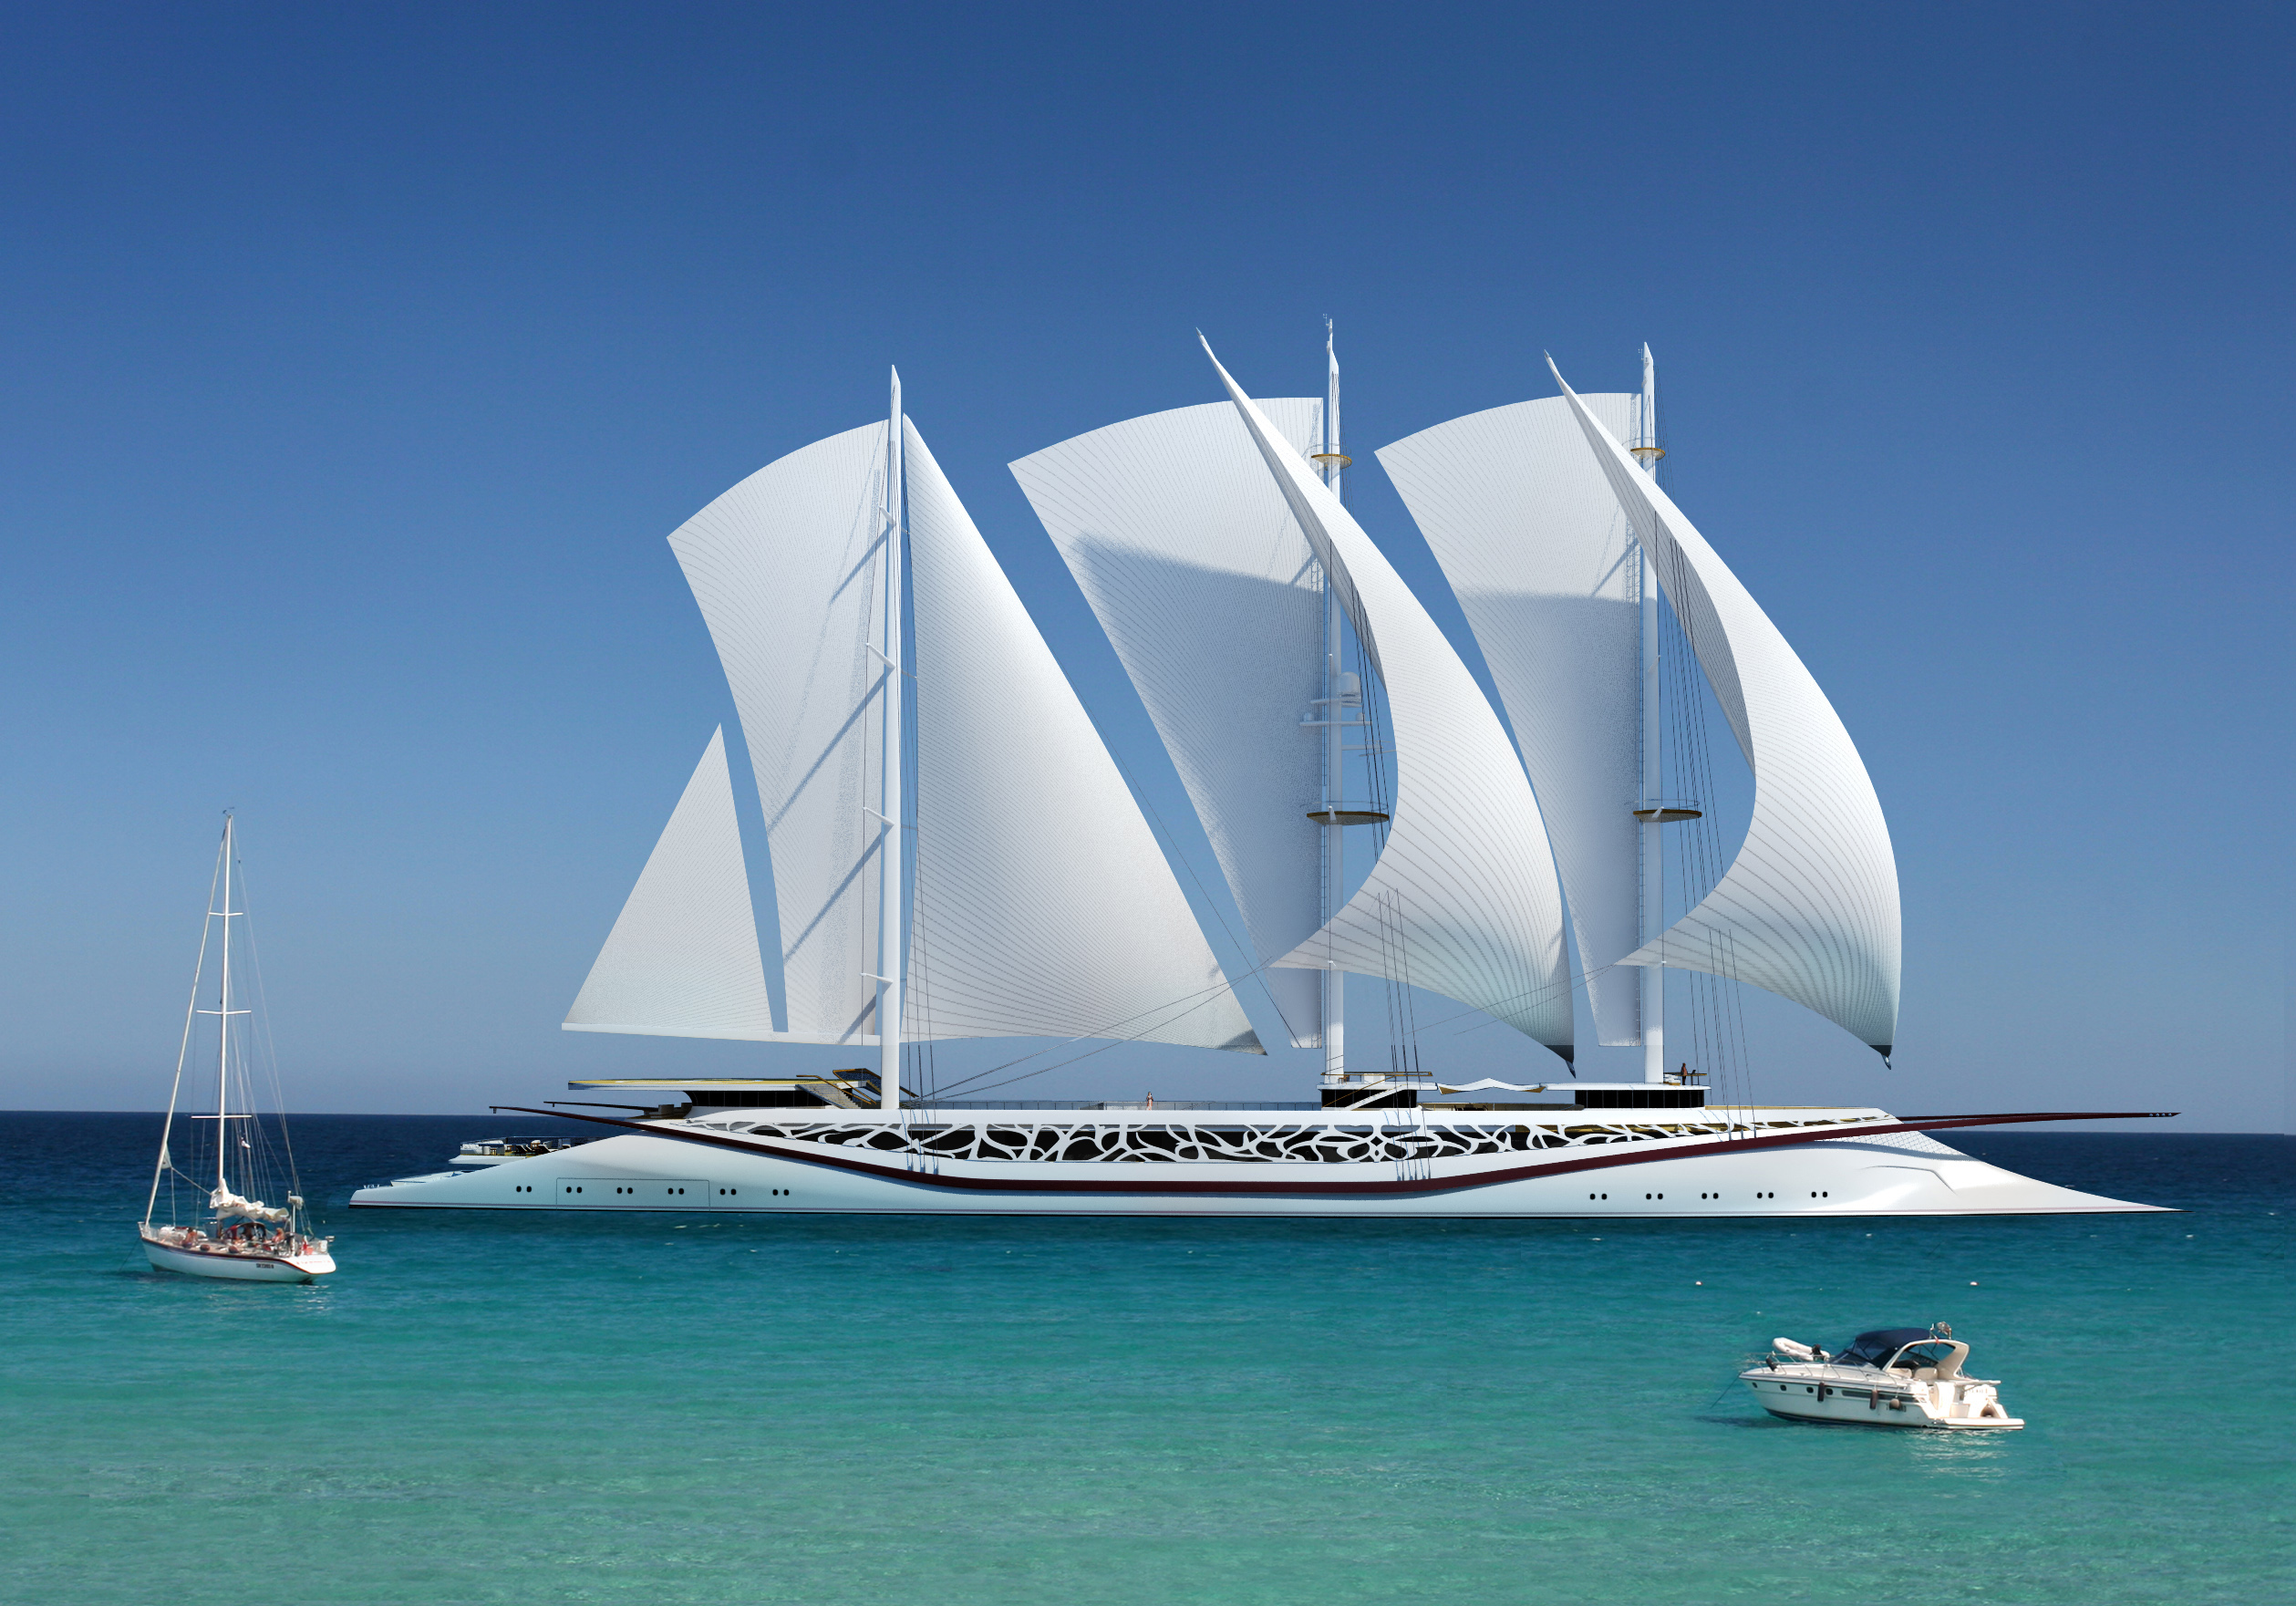 Phoenicia Yacht Concept By Igor Lobanov